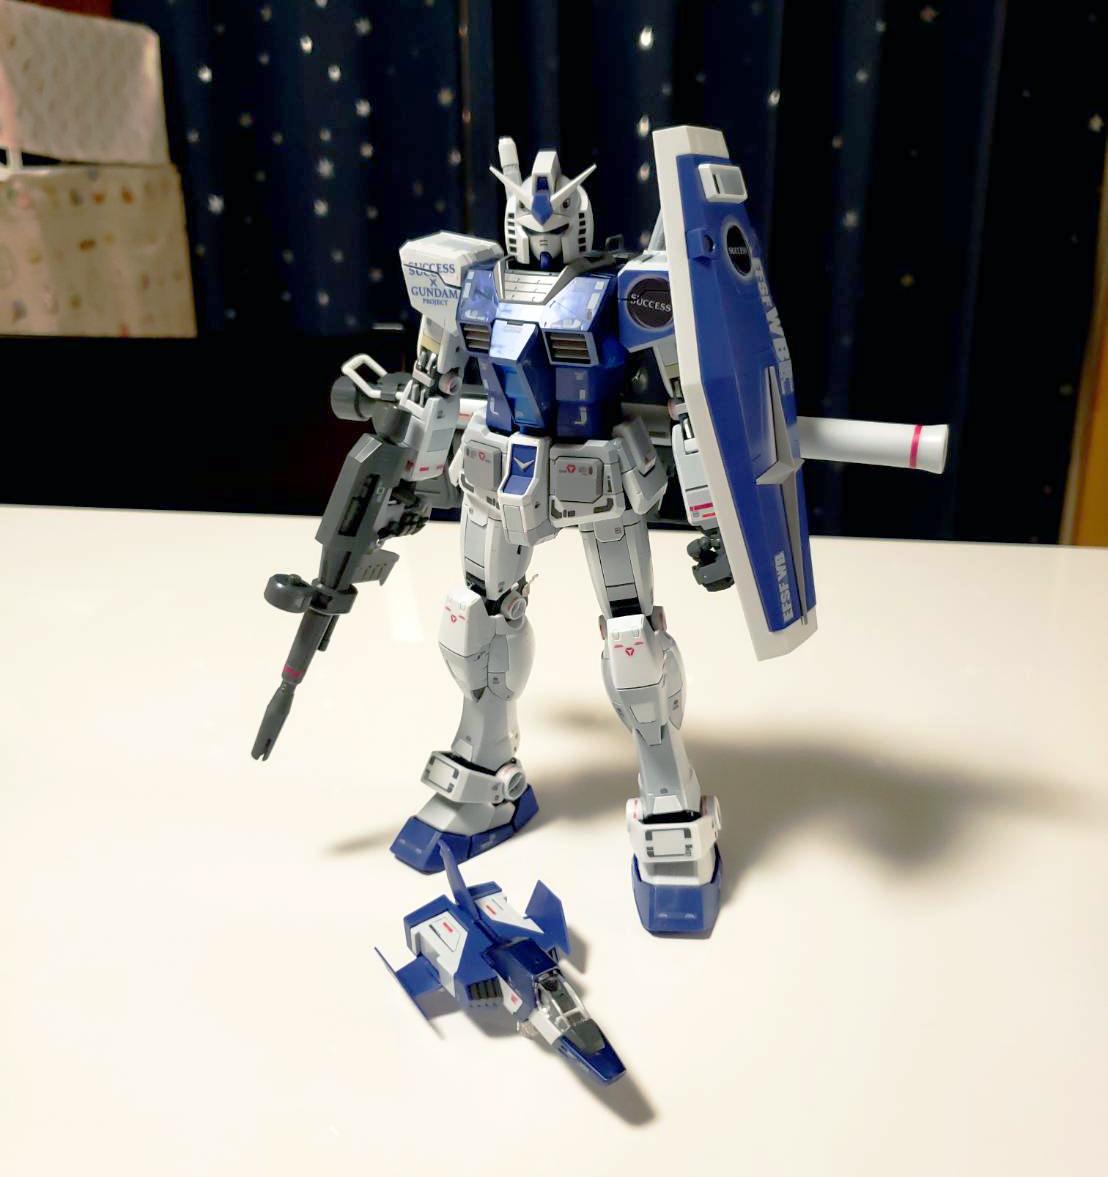 MG 1/100 ガンダム Ver.3.0 サクセスオリジナルカラーモデル [Gundam Ver.3.0 Success Original Color Model]